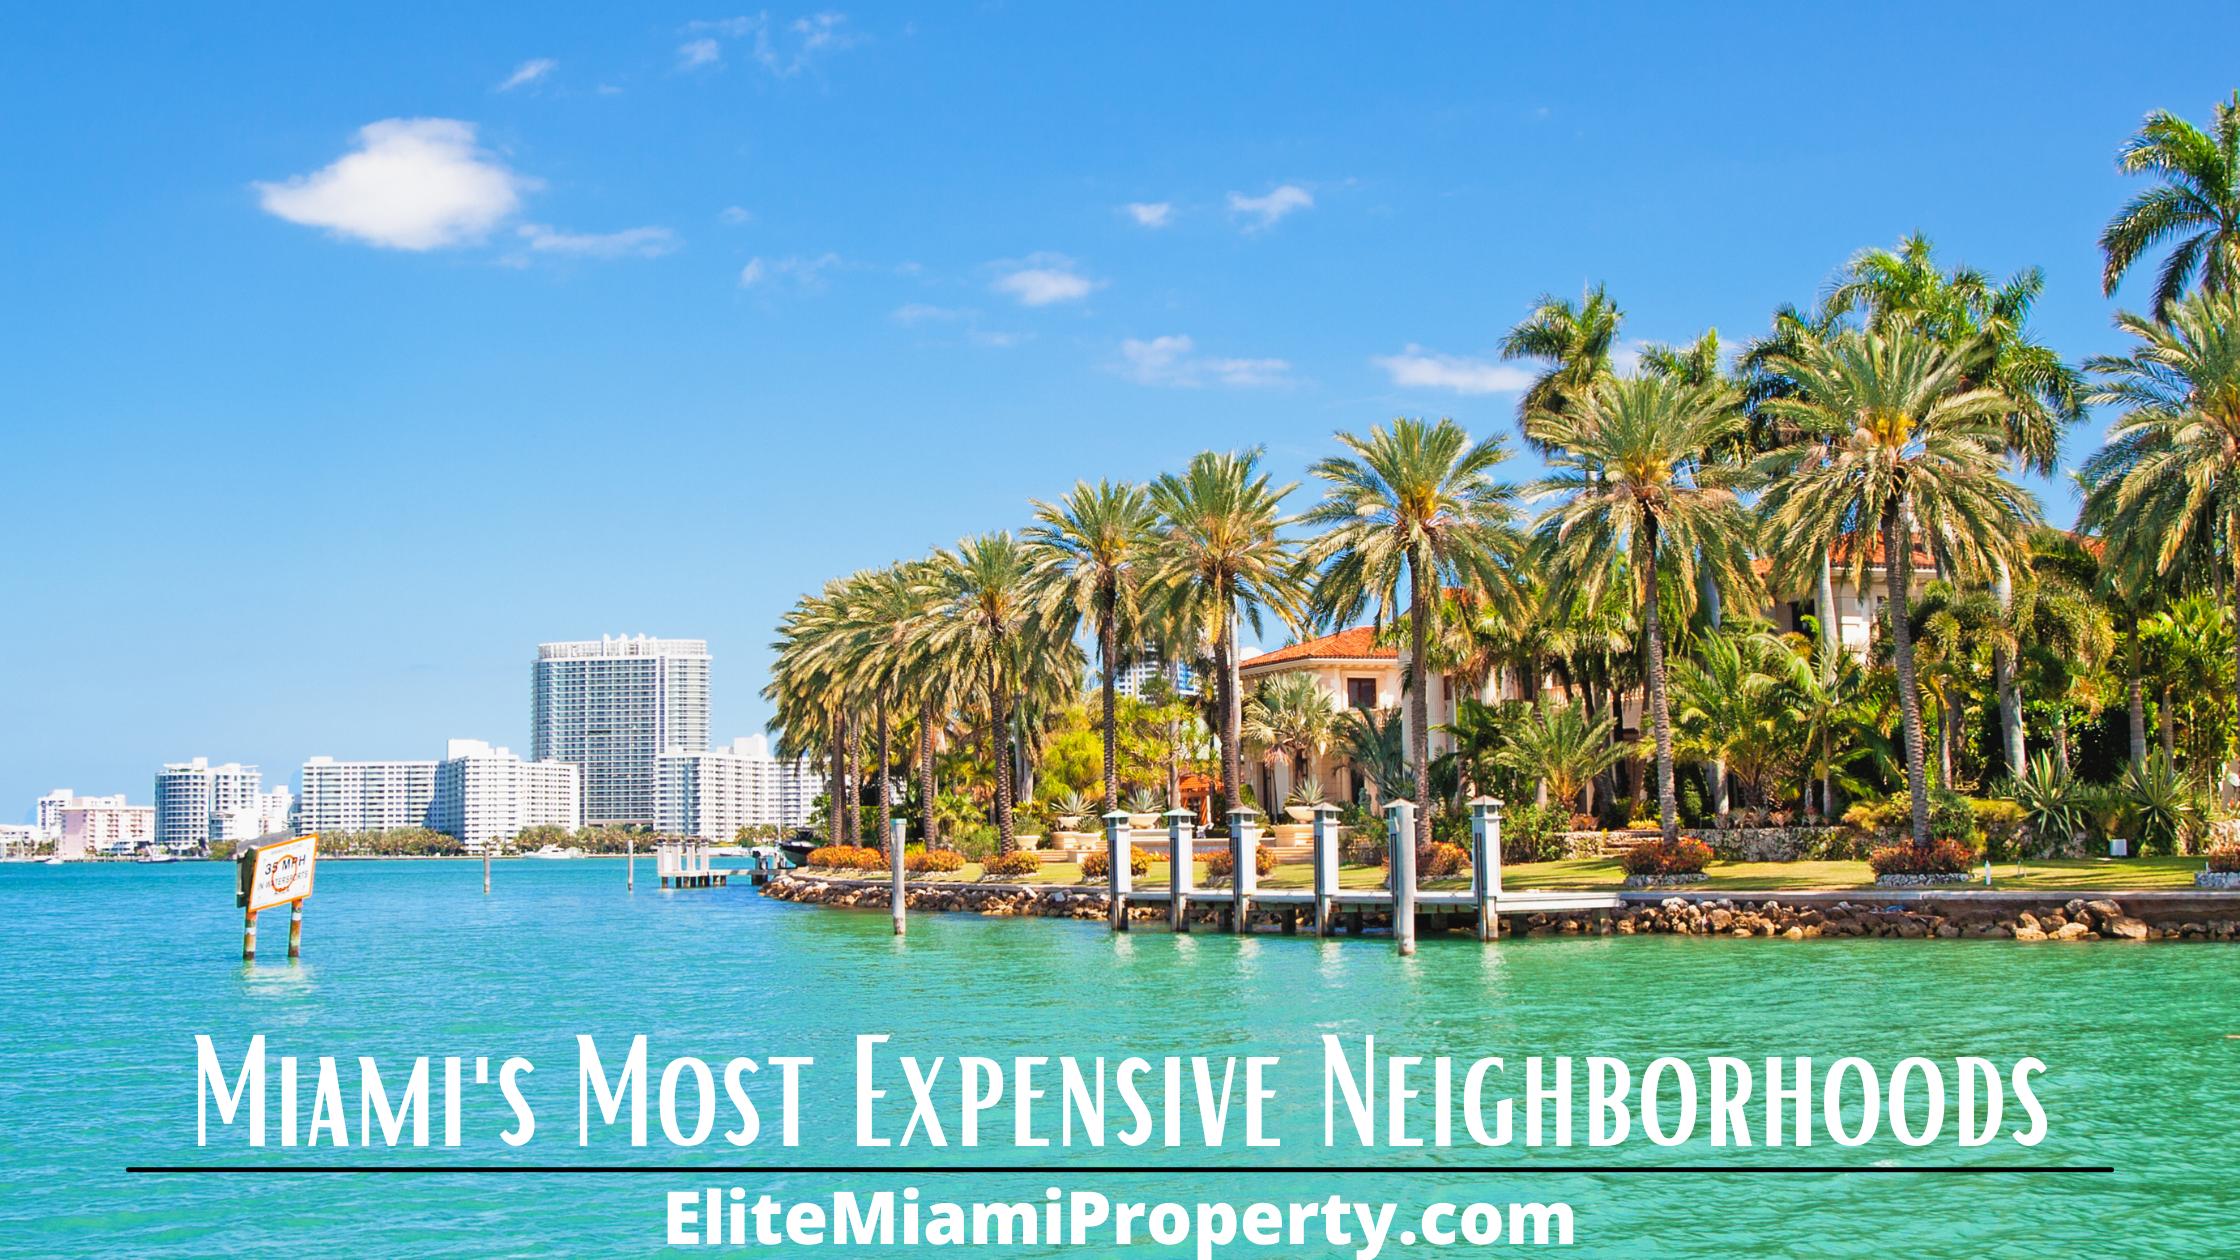 Top 3 Most Expensive Neighborhoods in Miami